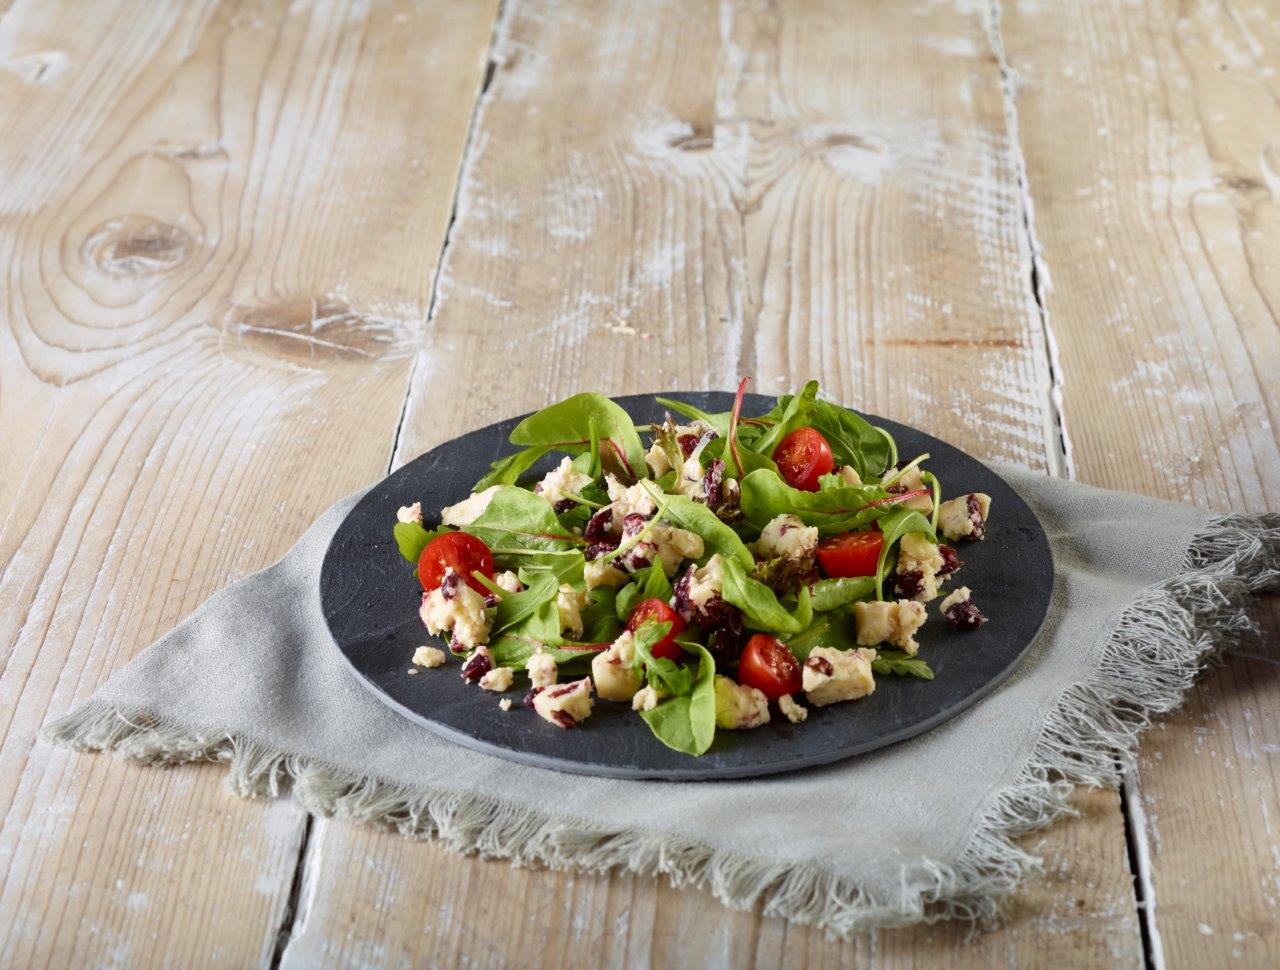 Yorkshire Wensleydale & Cranberries Cheese Salad